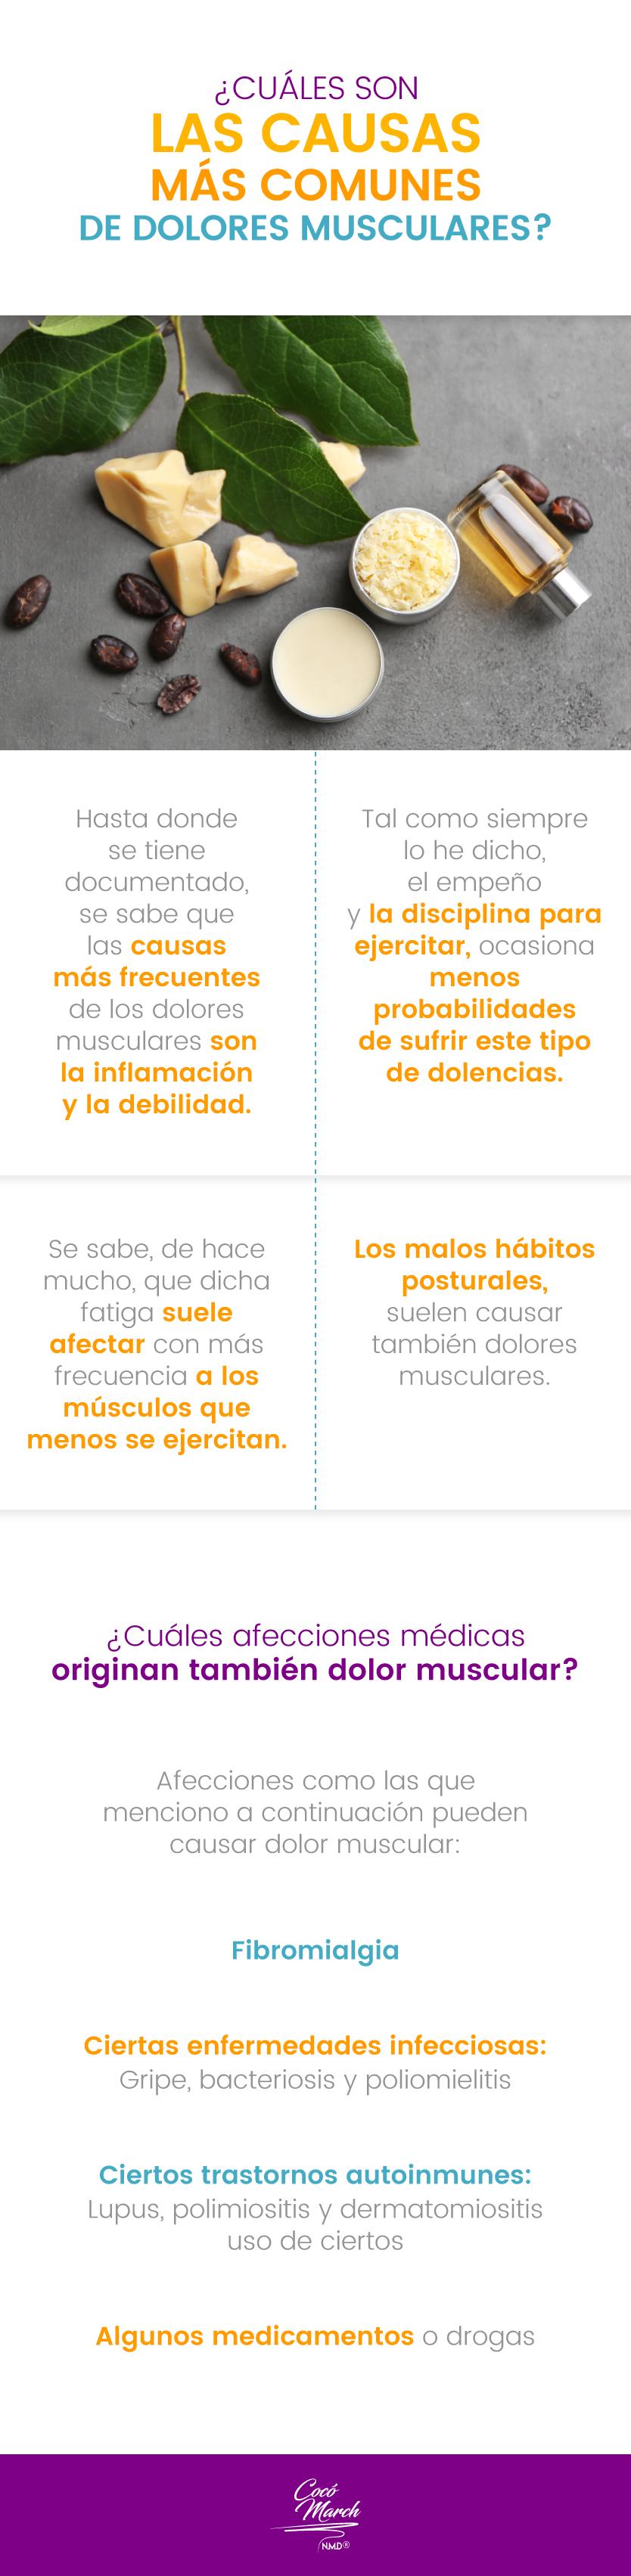 causas-dolores-musculares